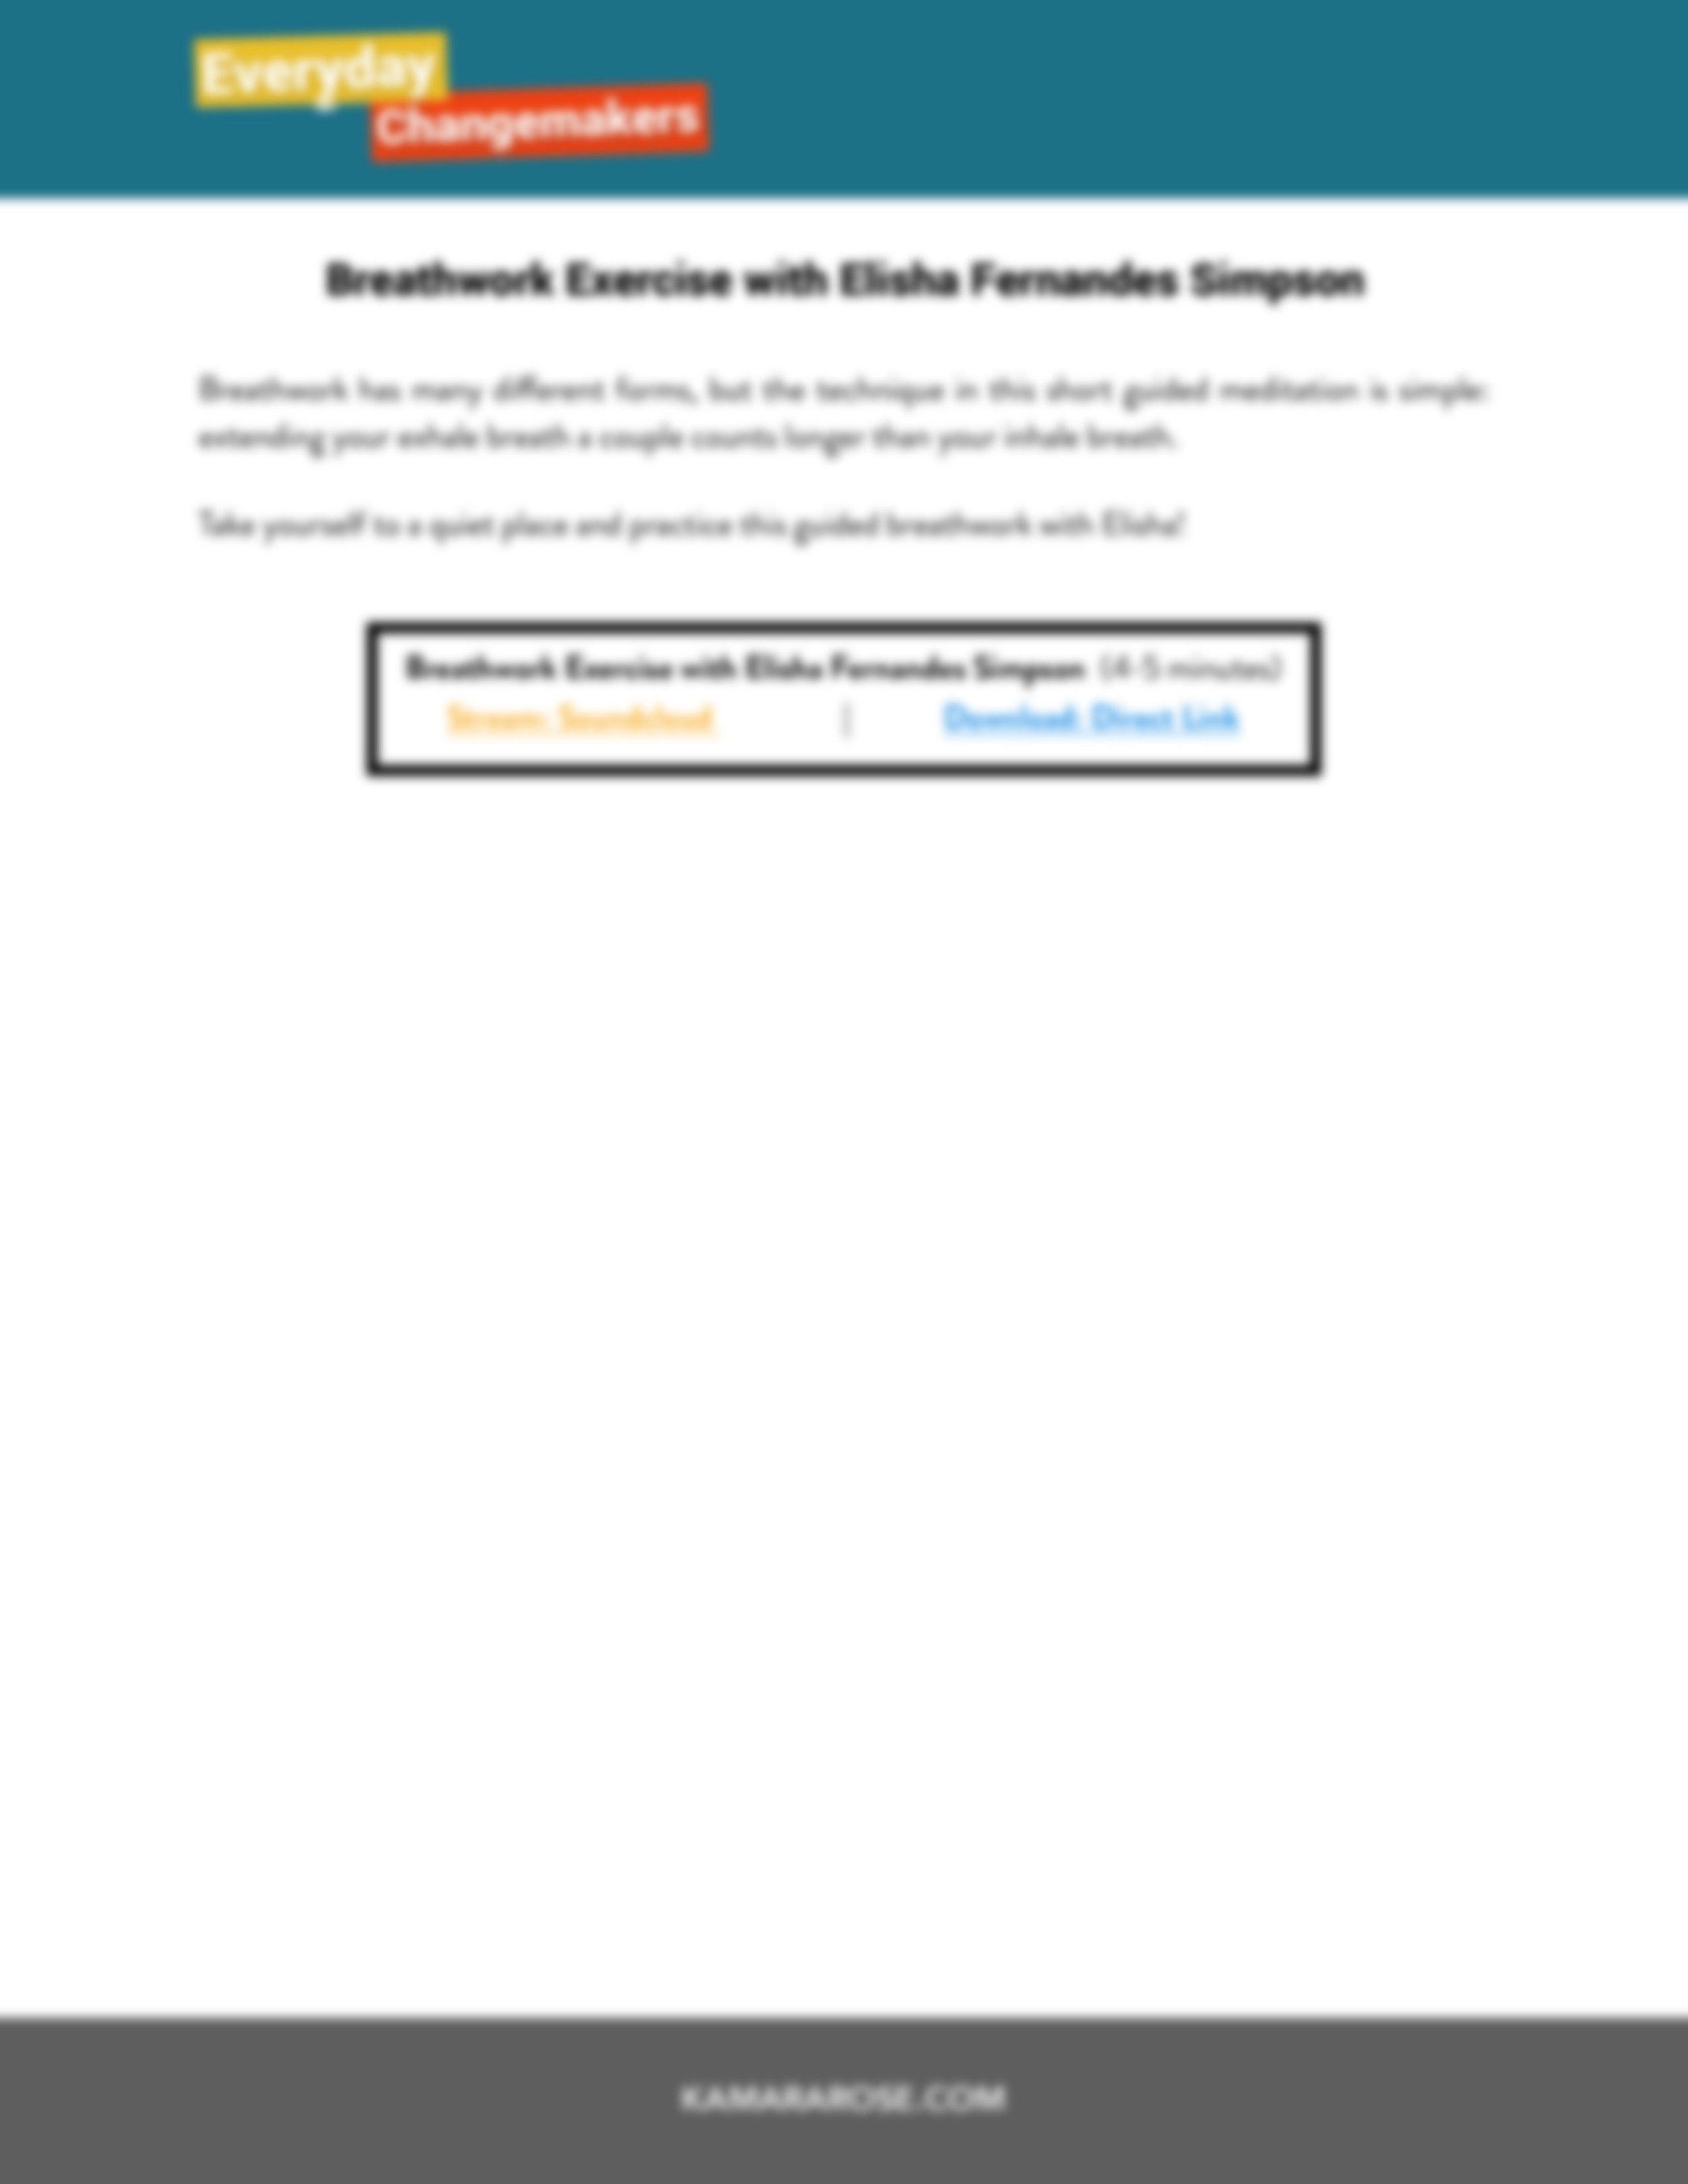 Breathwork-Exercise-with-Elisha(blur).jpg